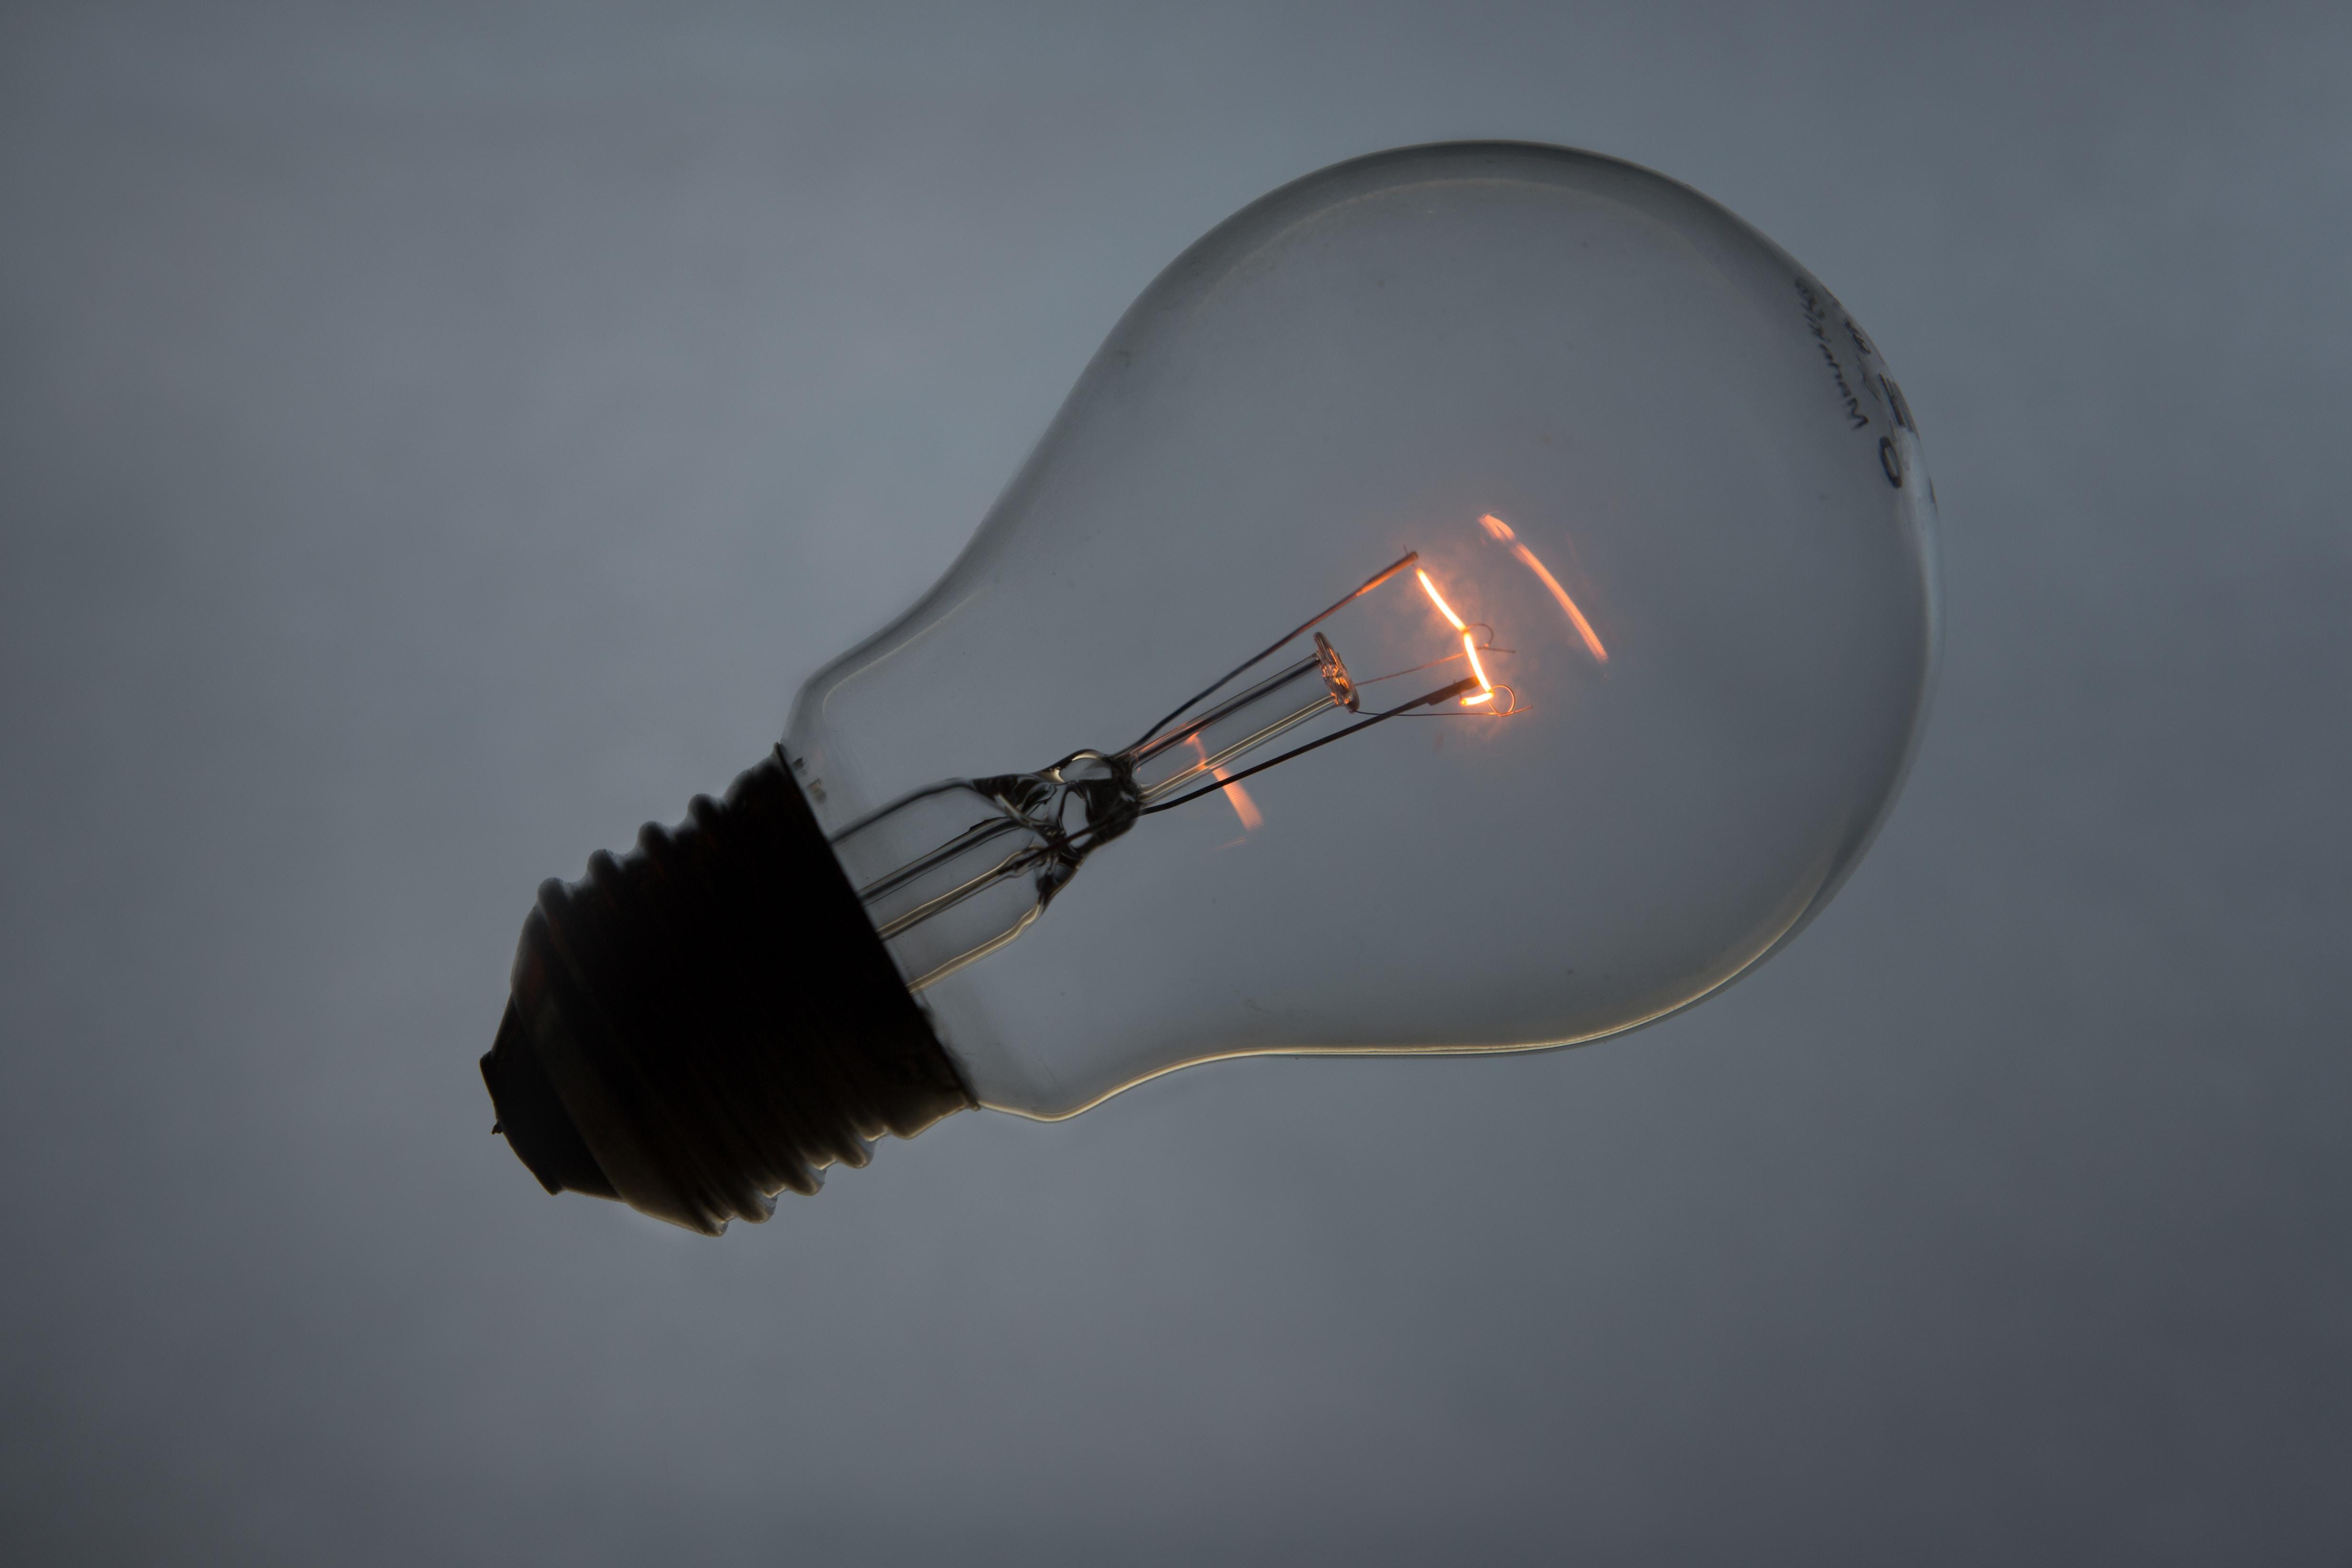 Wireless light bulb with glowing filament inside